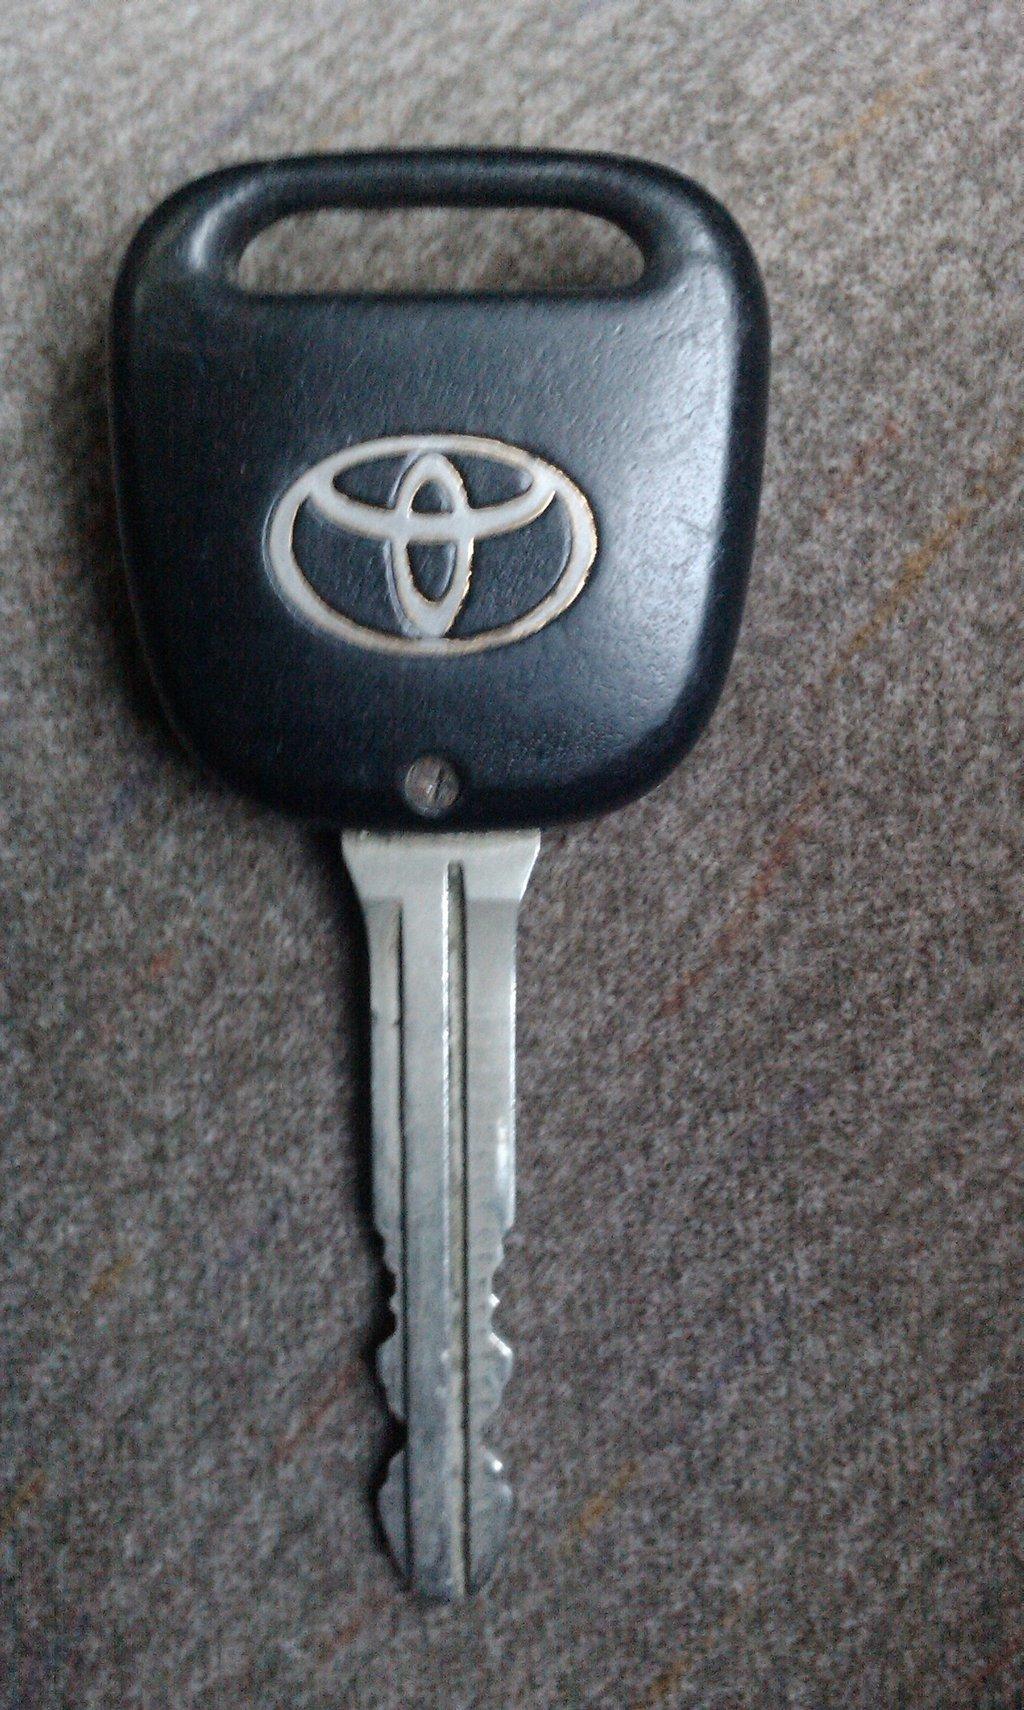 Потерял ключ с брелком от сигнализации 10